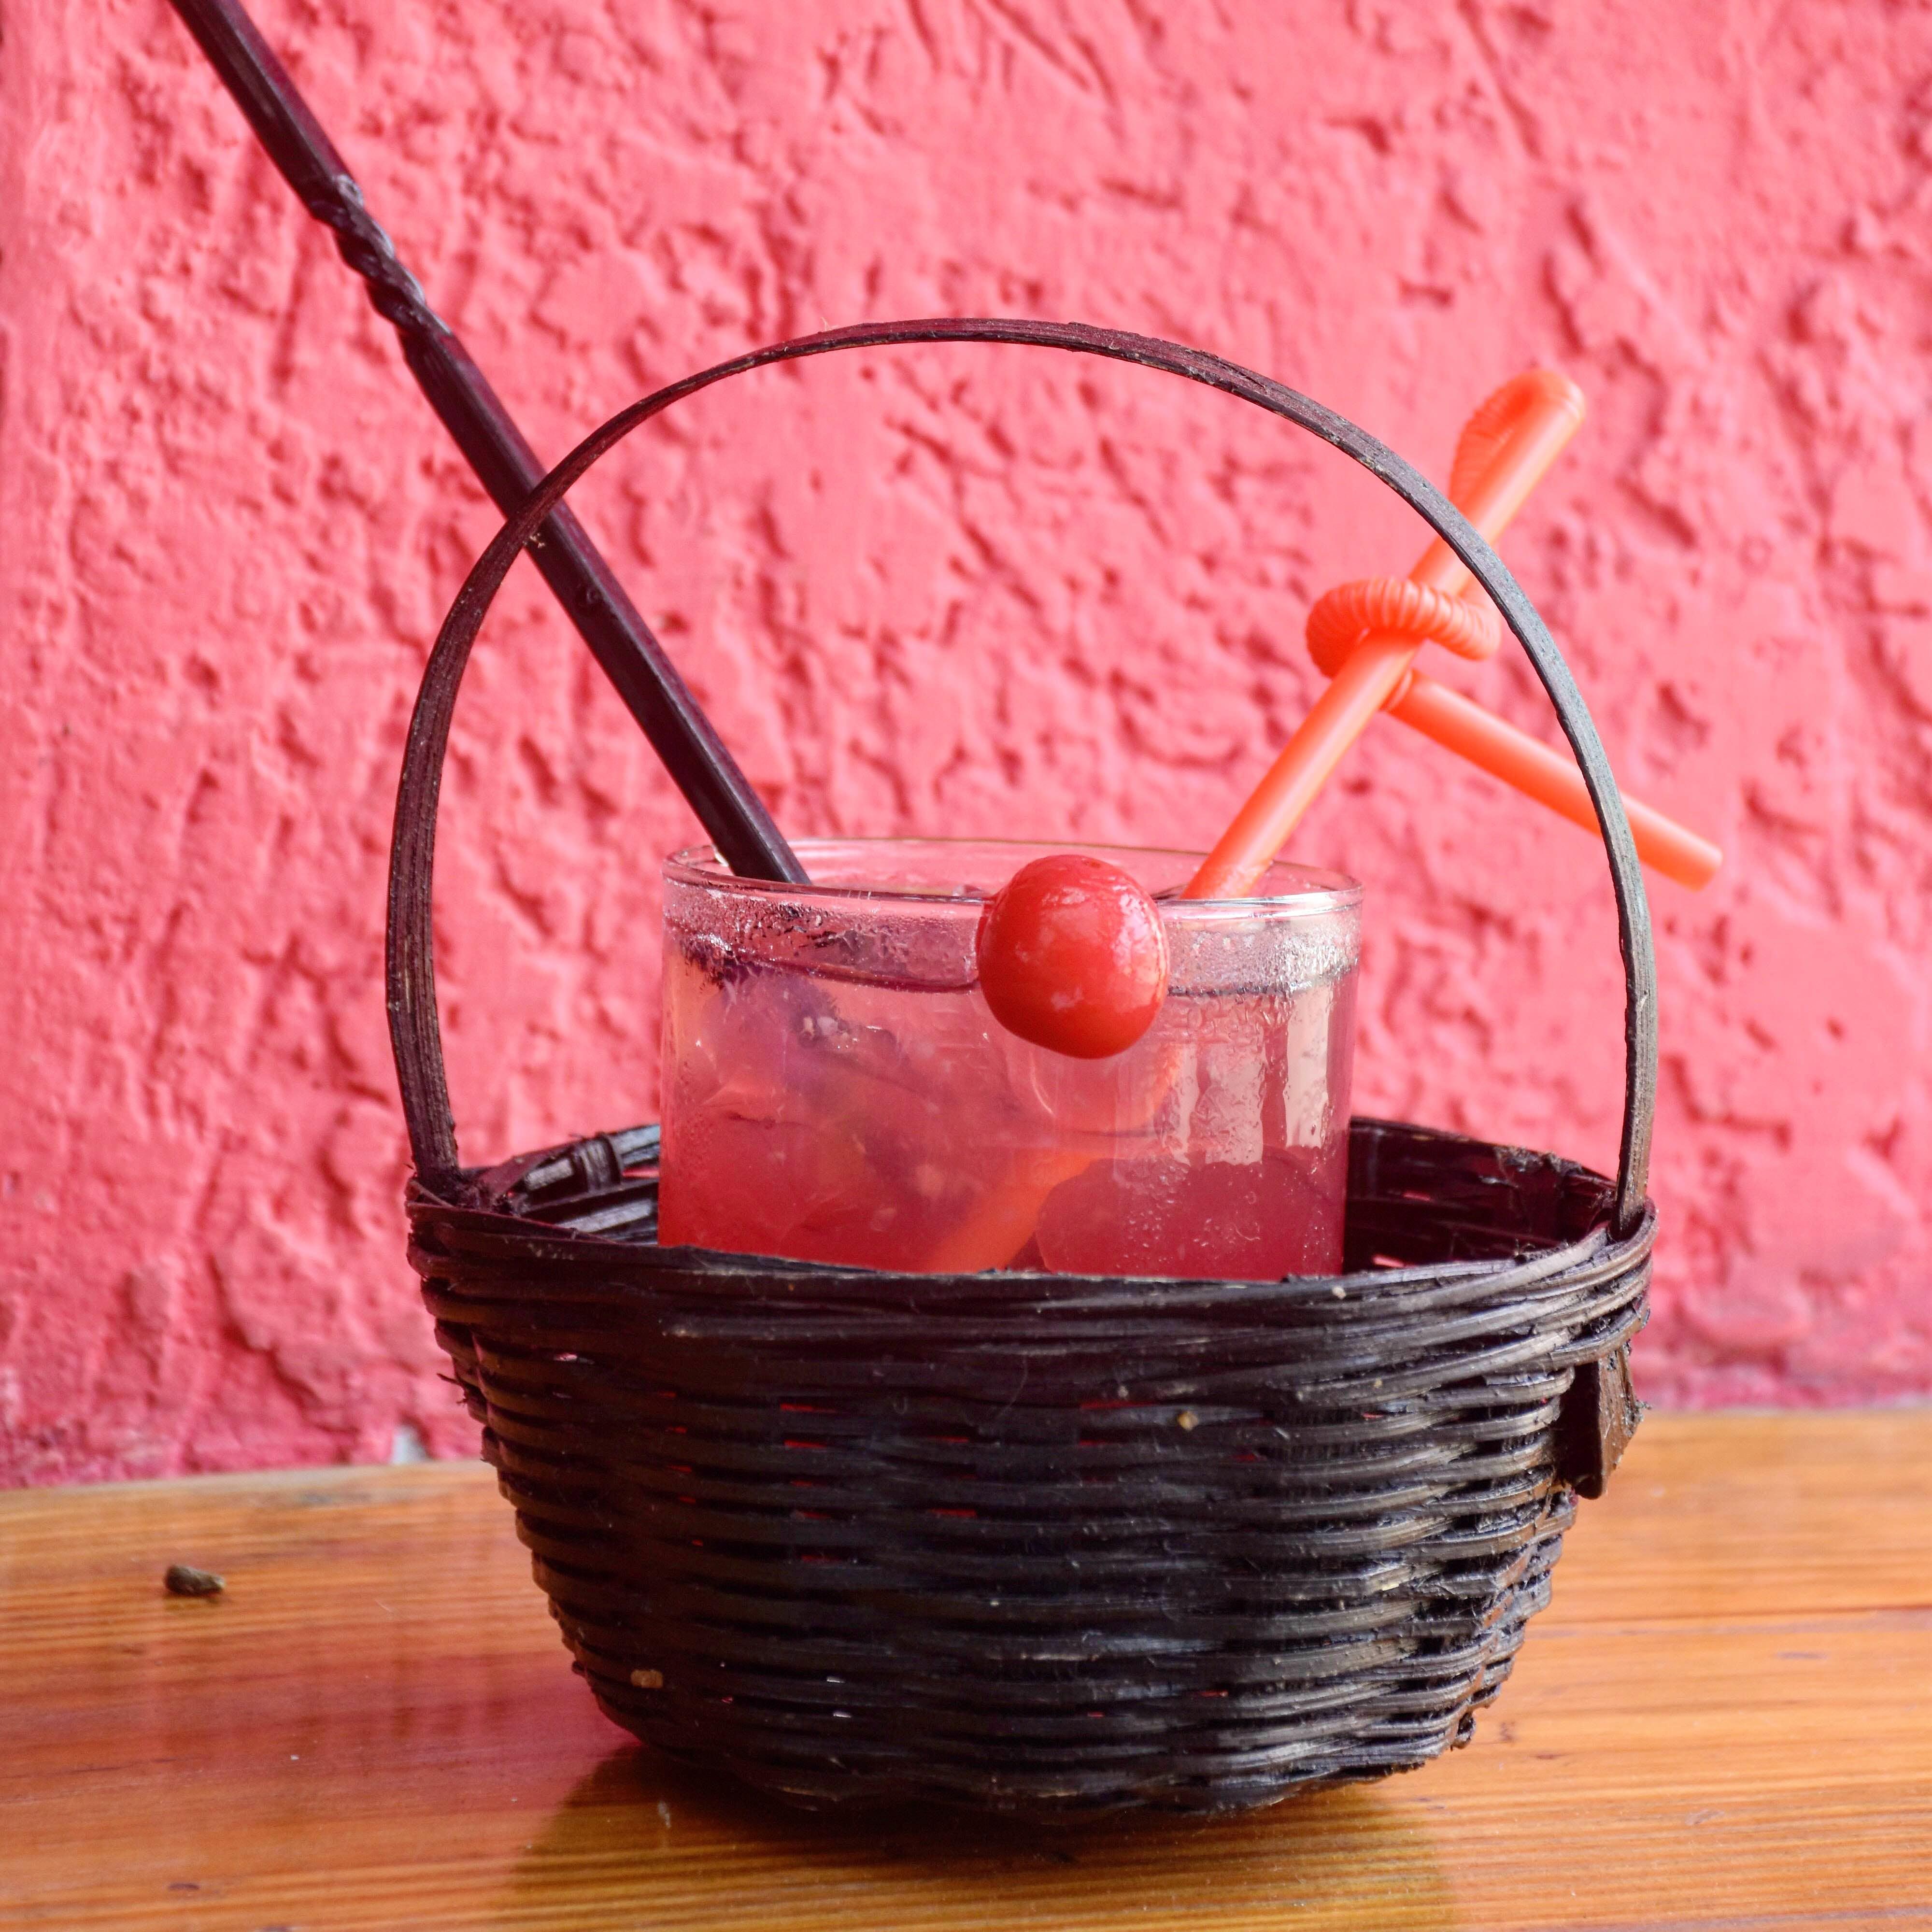 Bucket,Drinking straw,Food,Drink,Still life photography